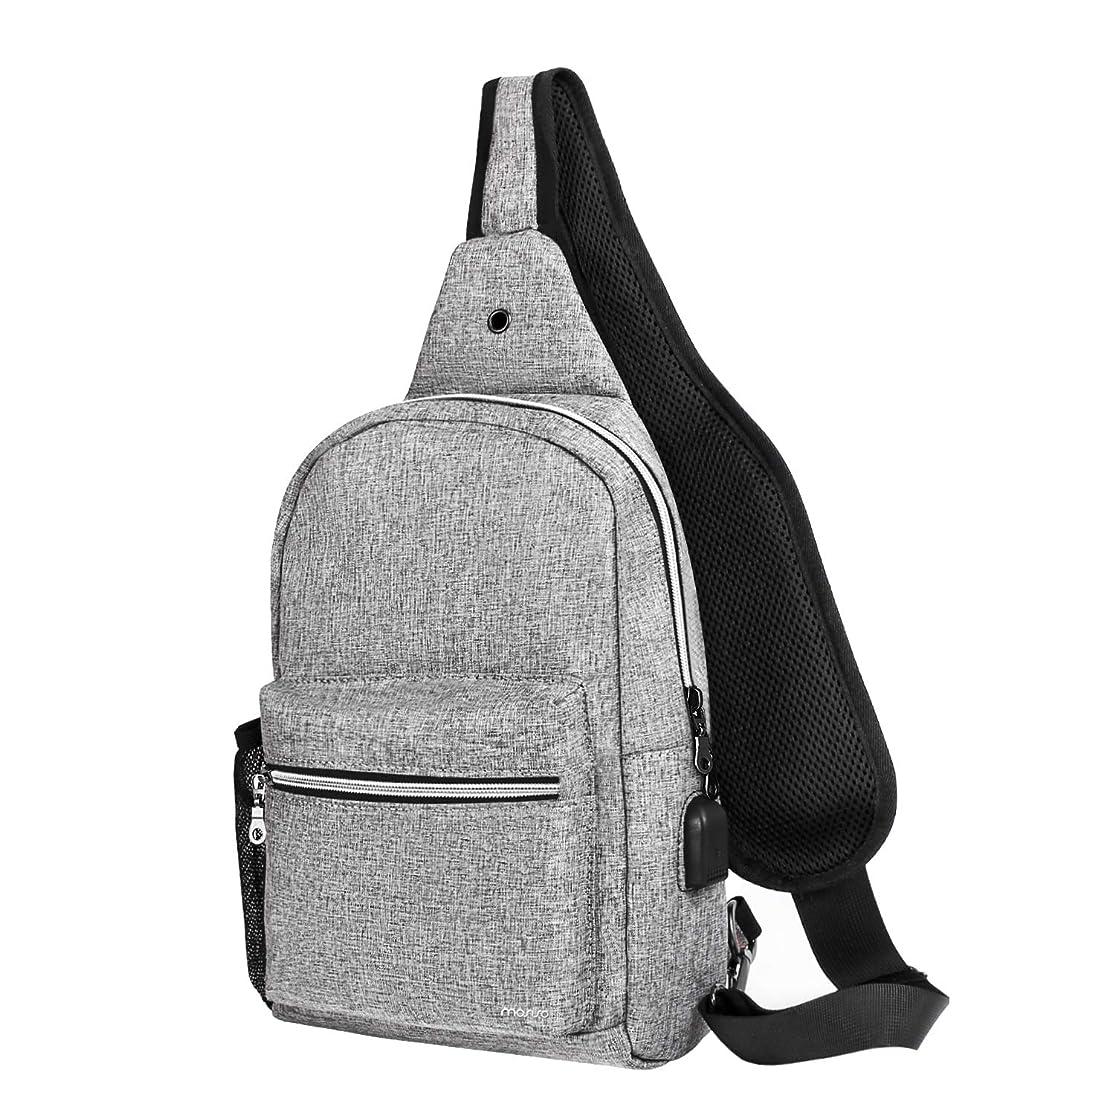 MOSISO Rope Sling Backpack with USB Charging Port, Polyester Chest Shoulder Crossbody Unbalance Gym Fanny Sack Satchel Travel Bag Outdoor Hiking Daypack for Men/Women hlgjcupc8